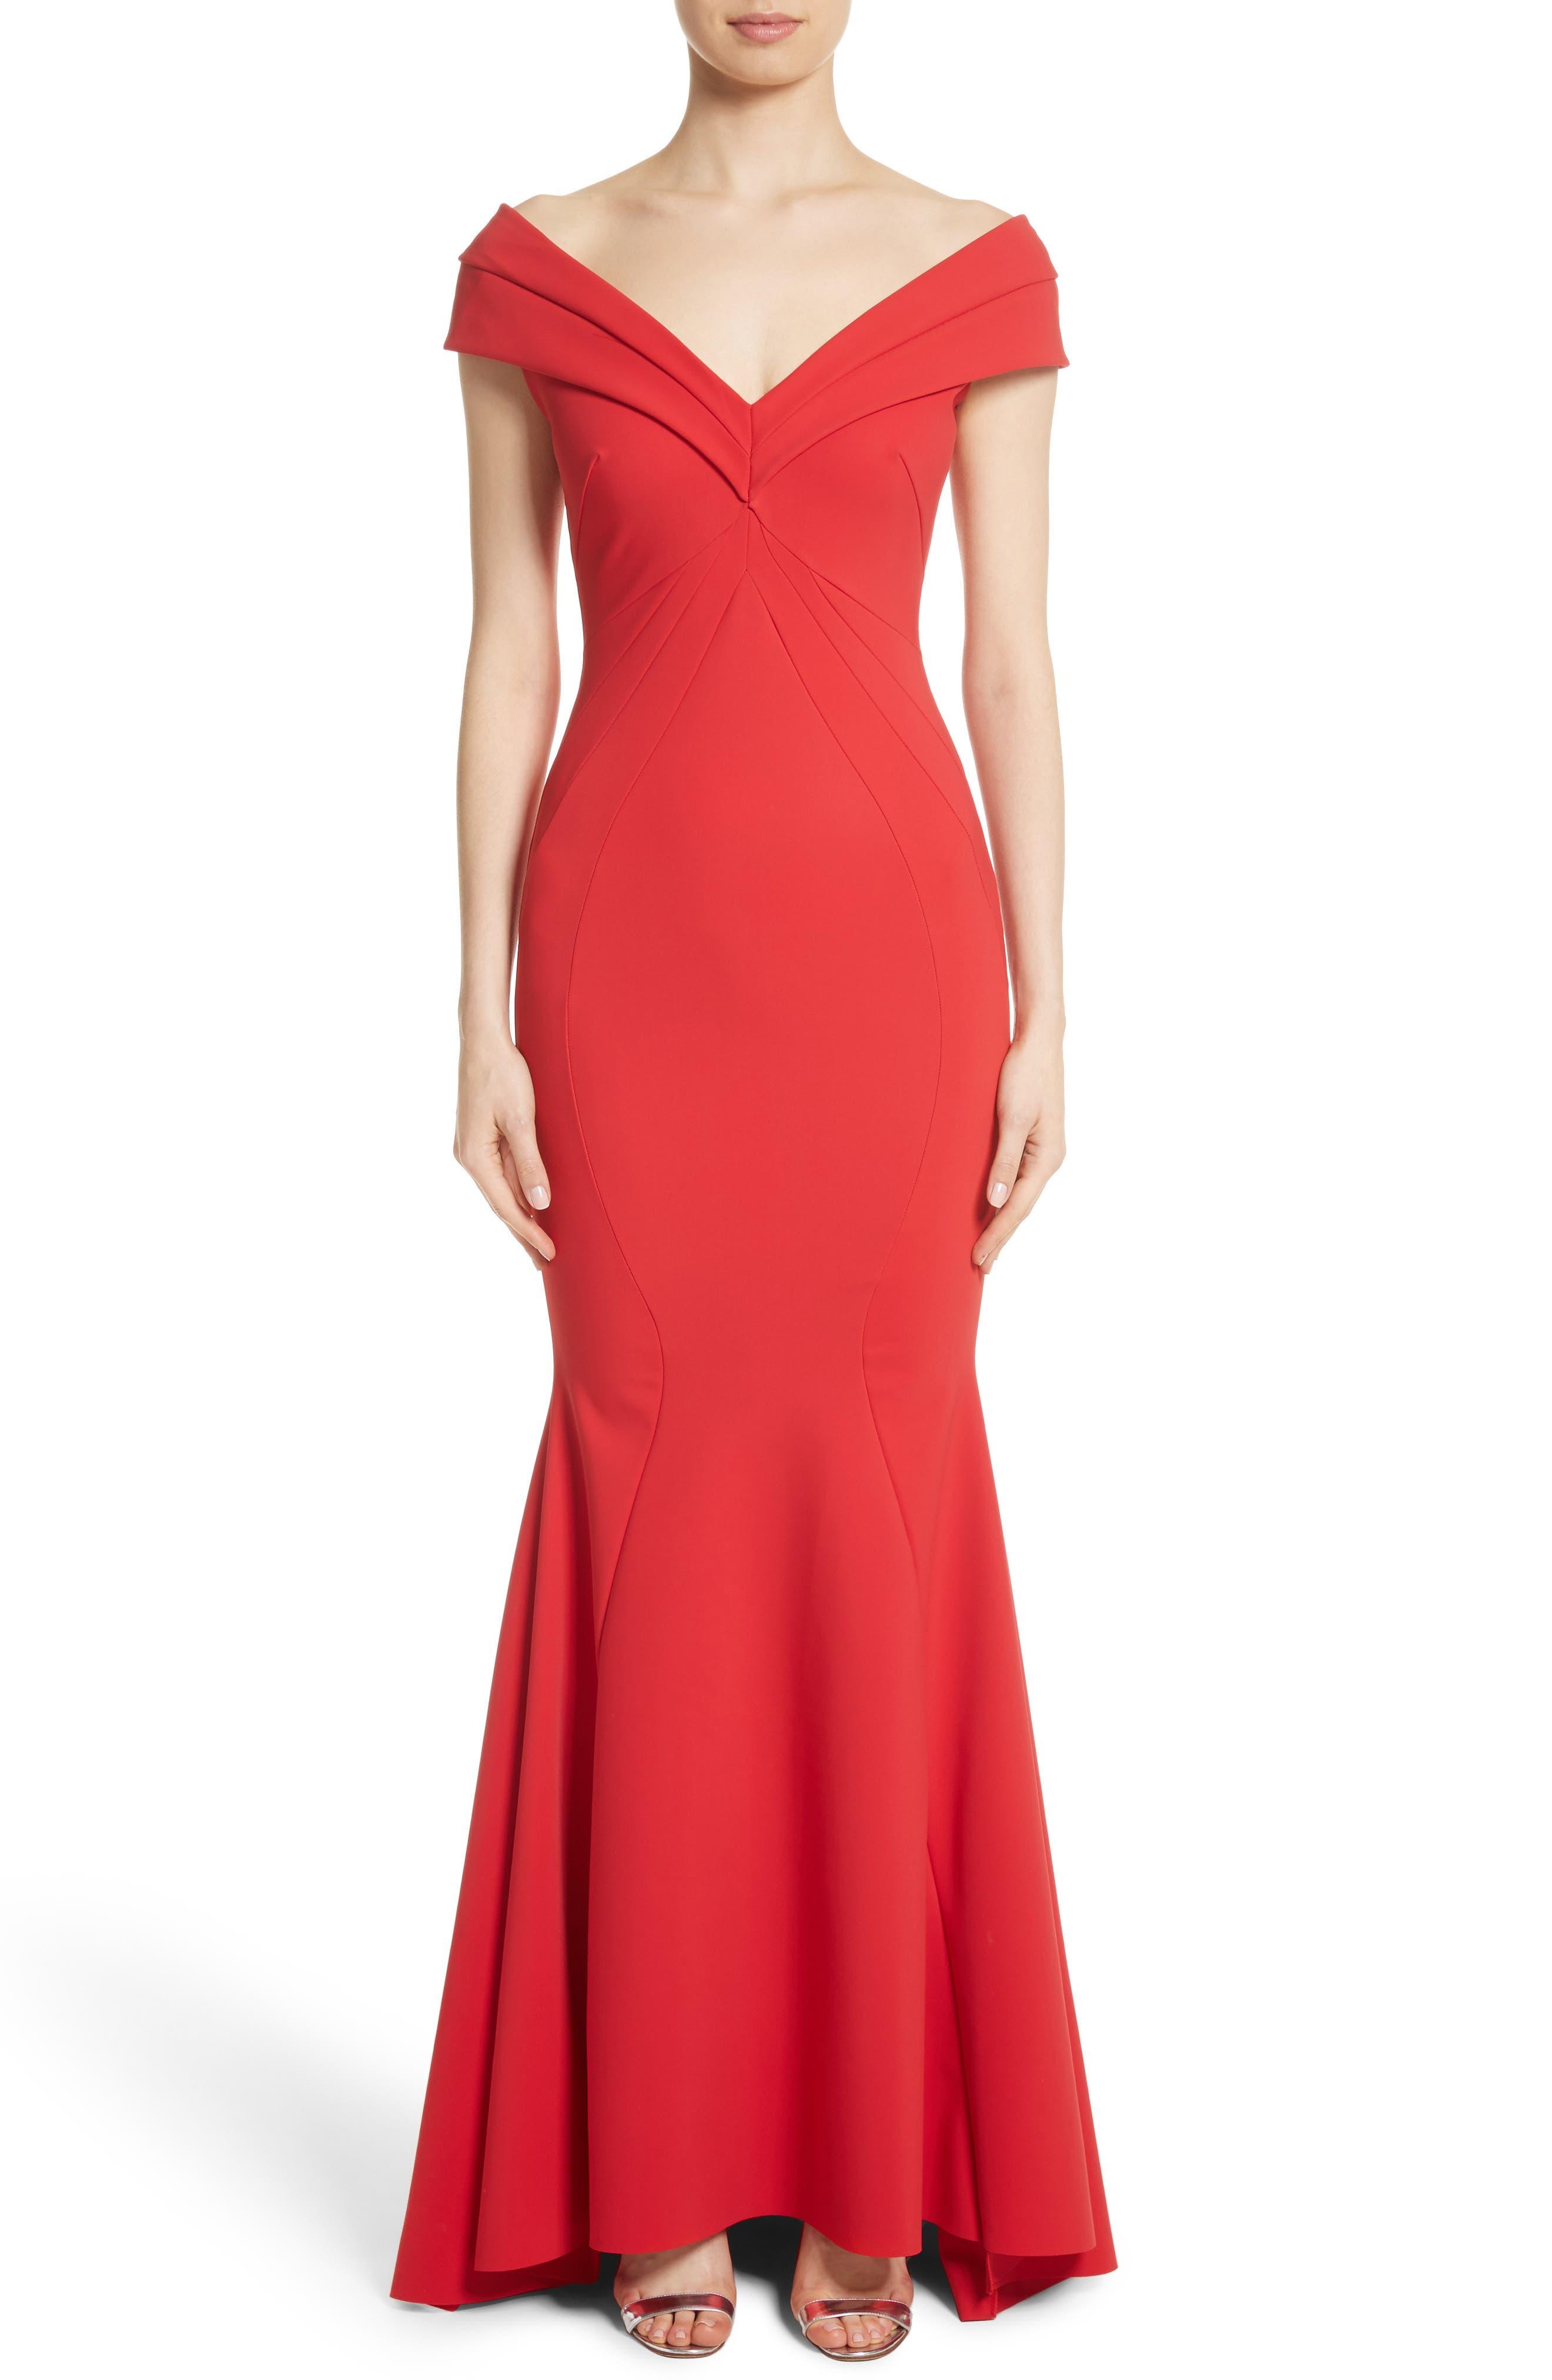 Main Image - Chiara Boni La Petite Robe Tally Off the Shoulder Trumpet Gown